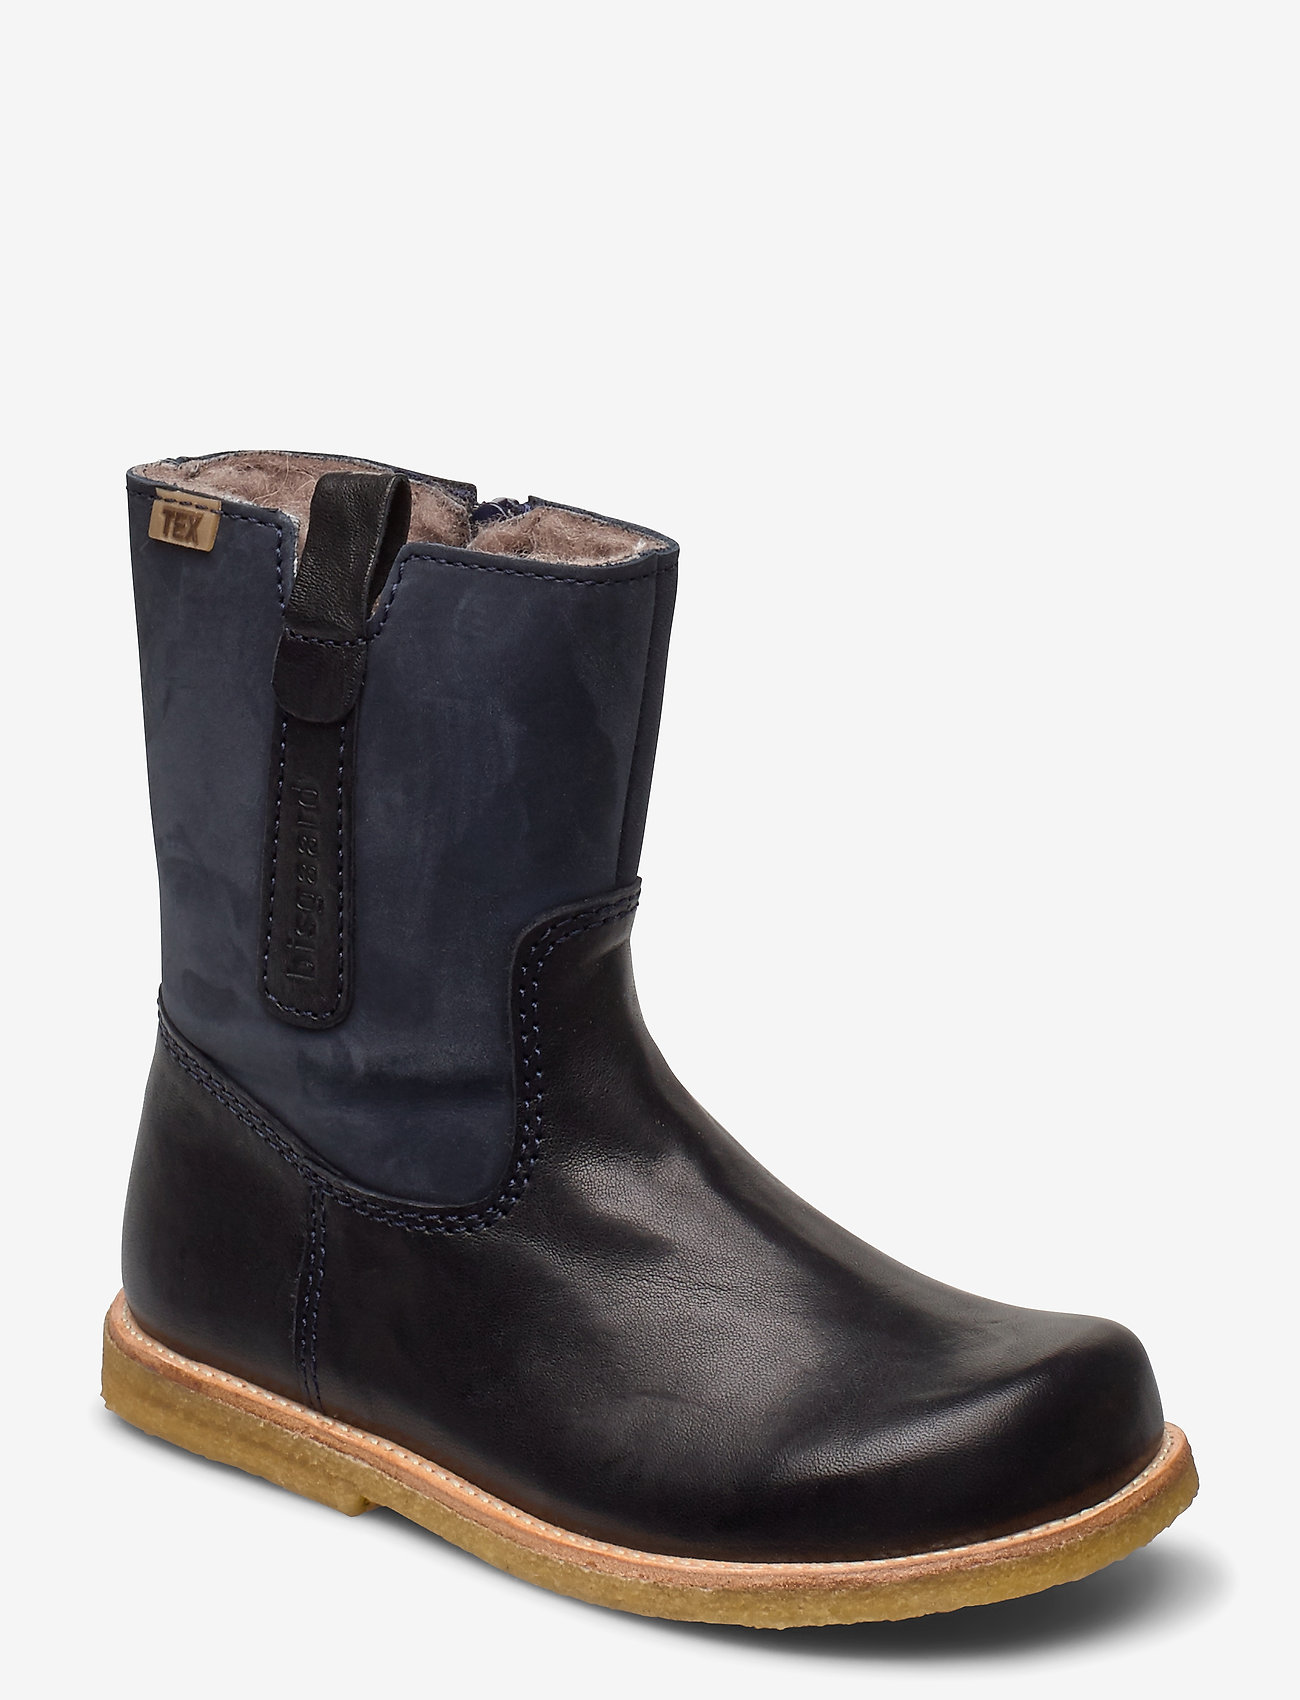 Bisgaard - bisgaard elke - vinterstøvler - black - 0